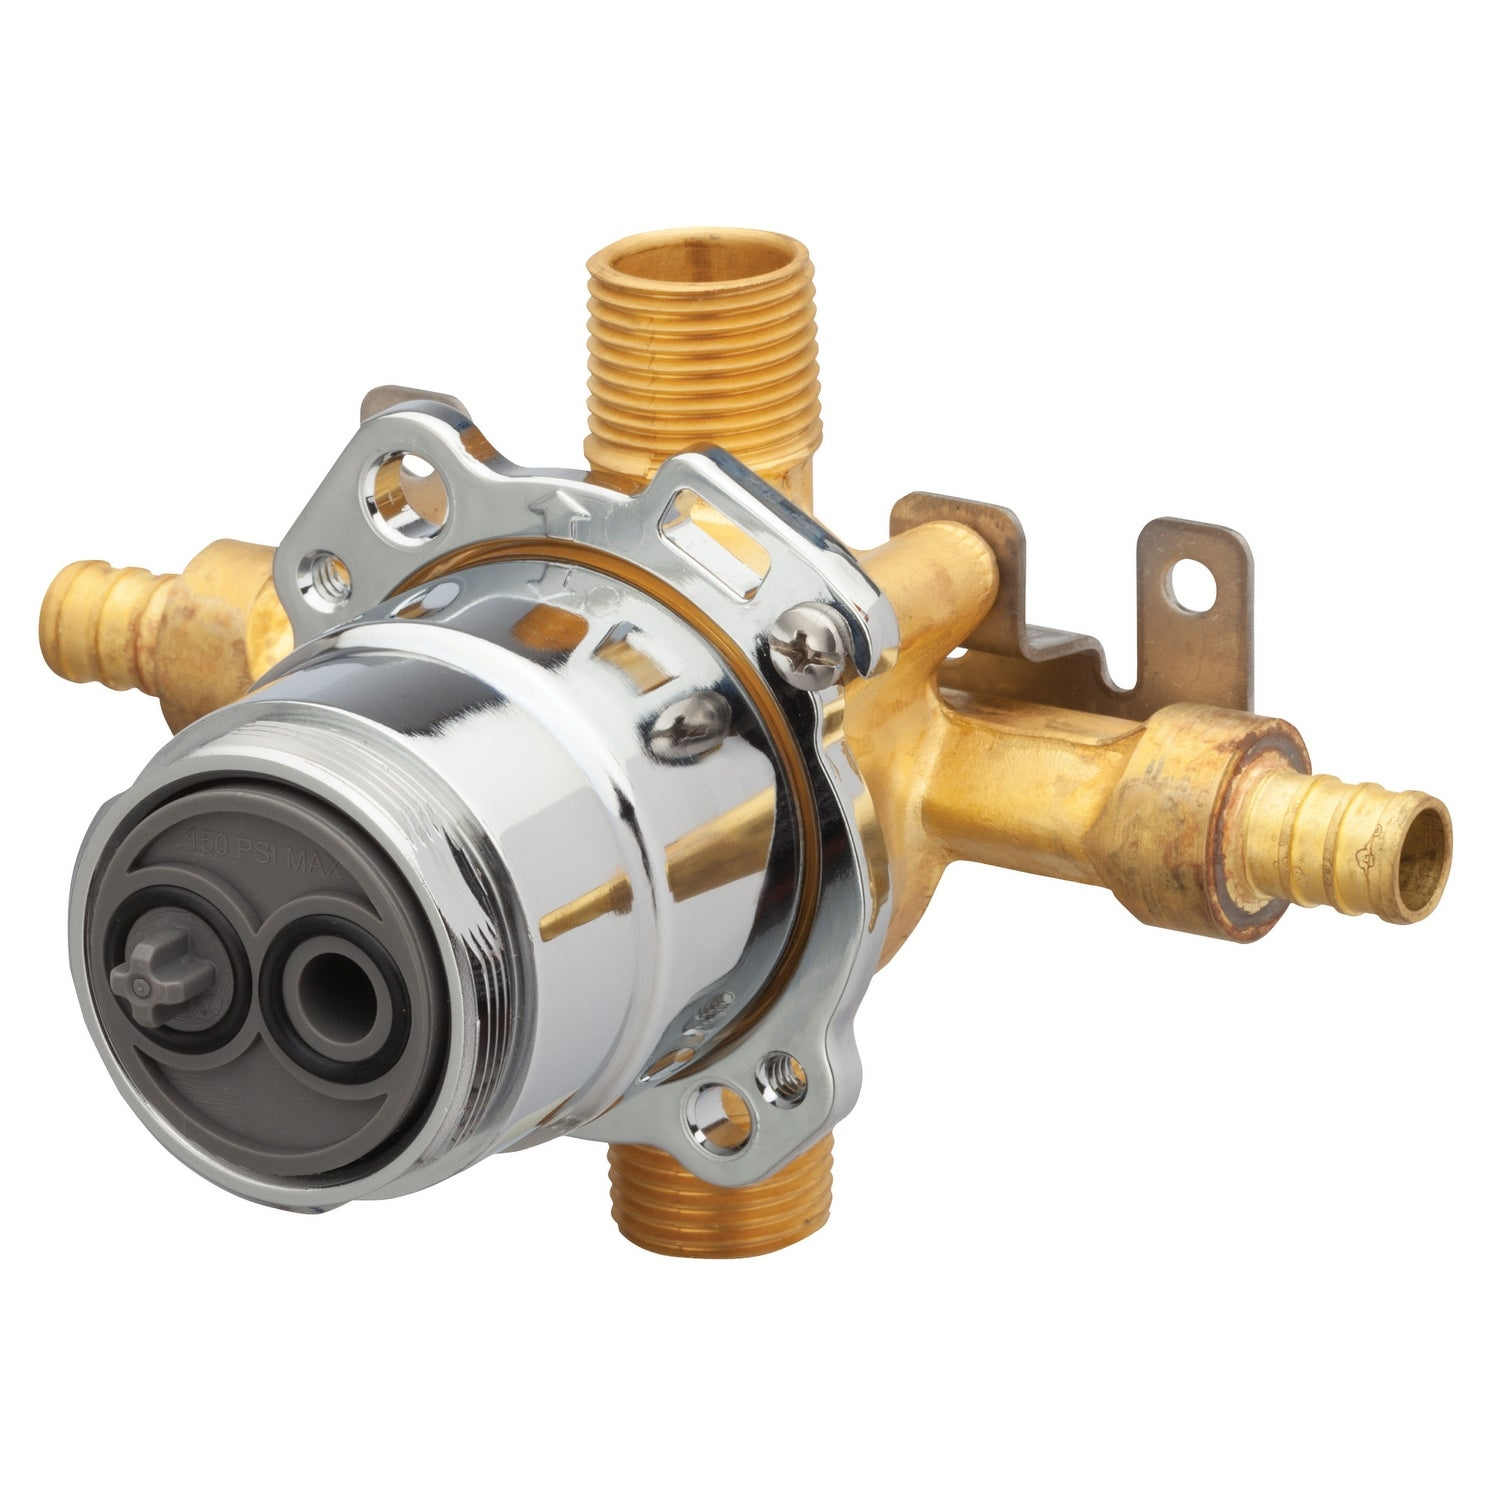 Gerber Gs 504 Treysta Tub And Shower Valve F1807 Crimp Pex Natural Overstock 25725580